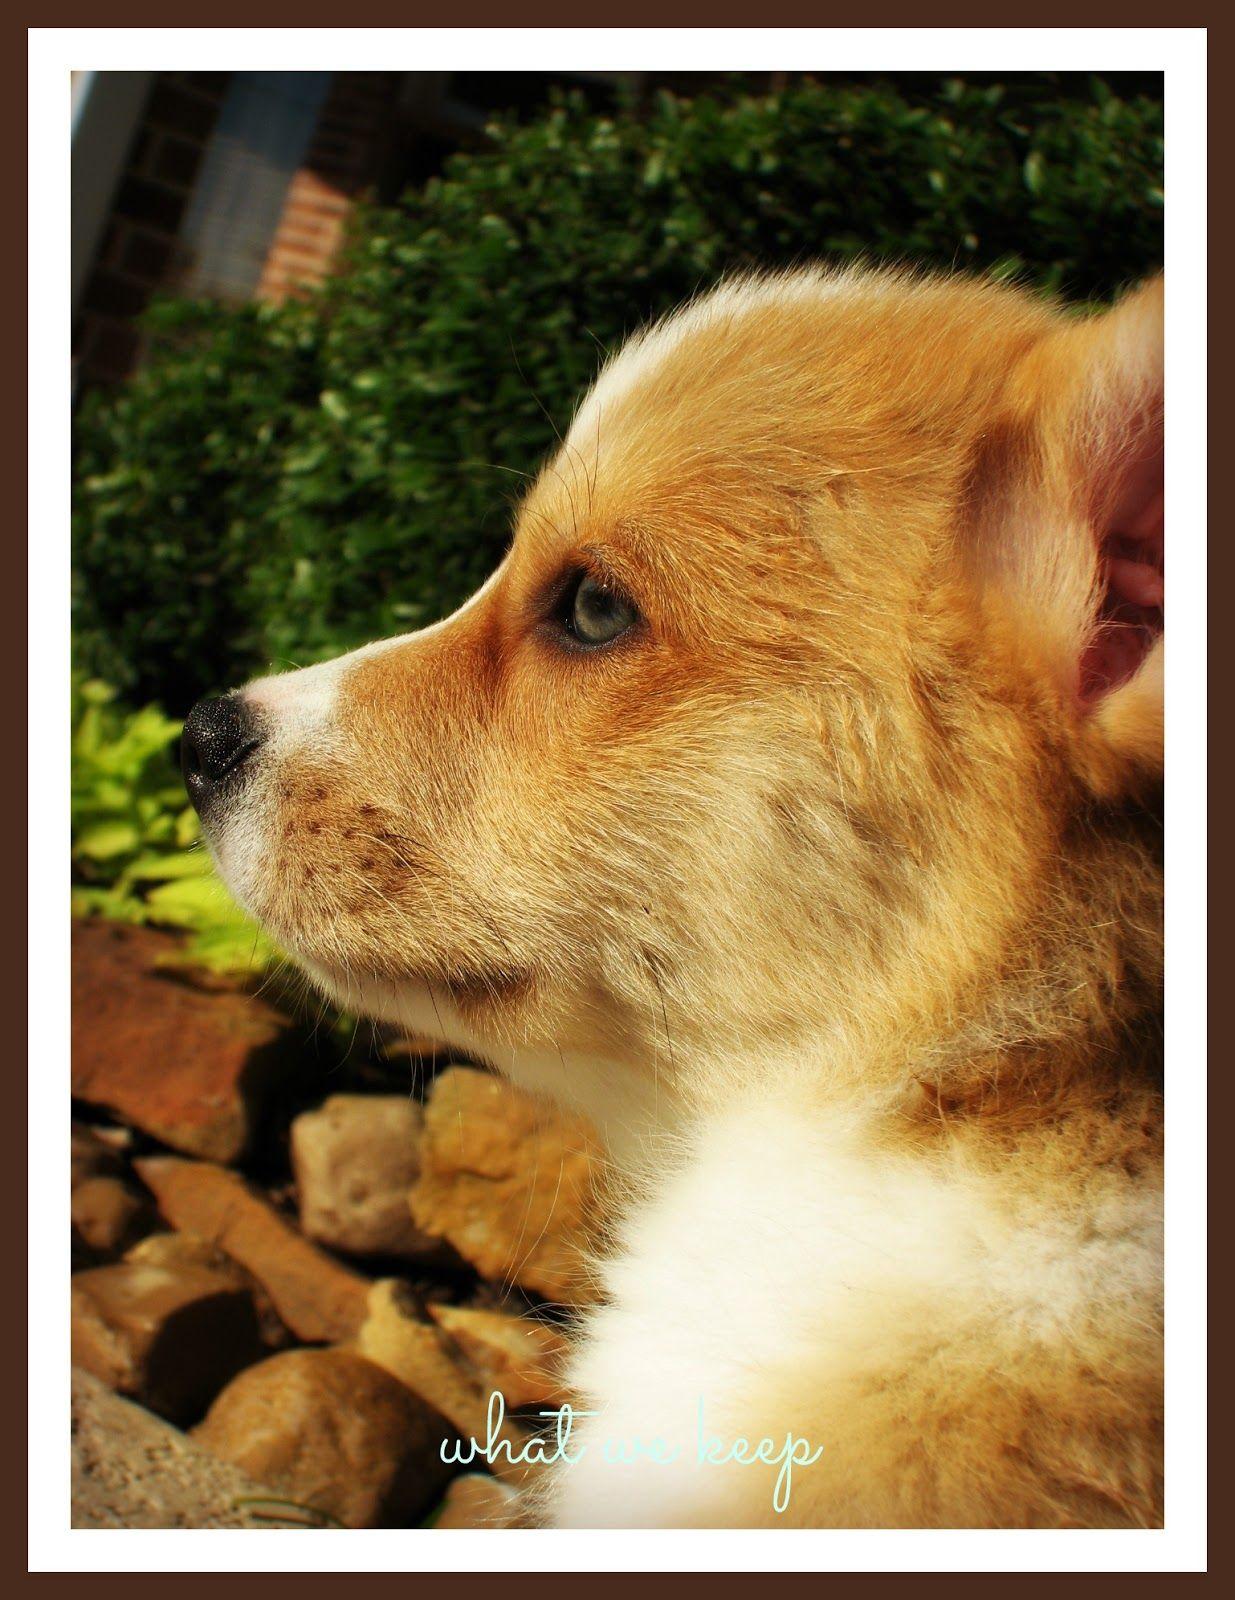 Henry pup cute puppy cute